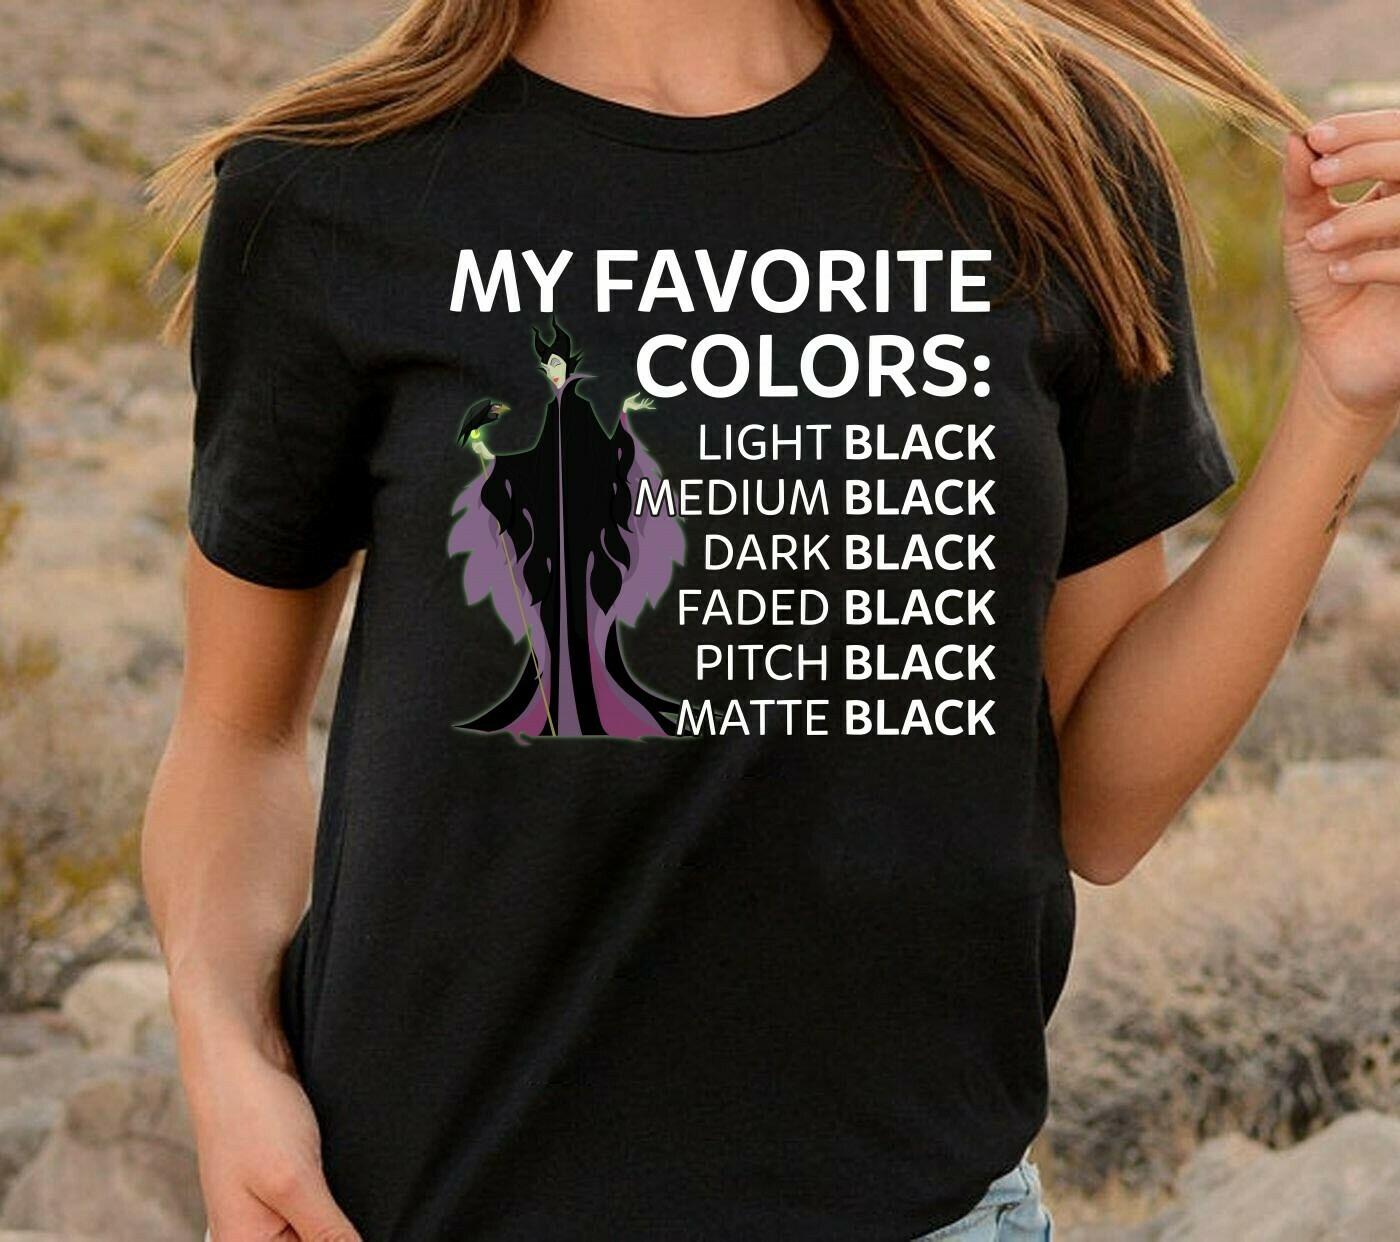 My Favorite Colors Black Maleficent Disney Villains Bad Girls Have More Fun Walt Disney World Disneyland Park Family Vacation T Shirt Long Sleeve Sweatshirt Hoodie Jolly Family Gifts